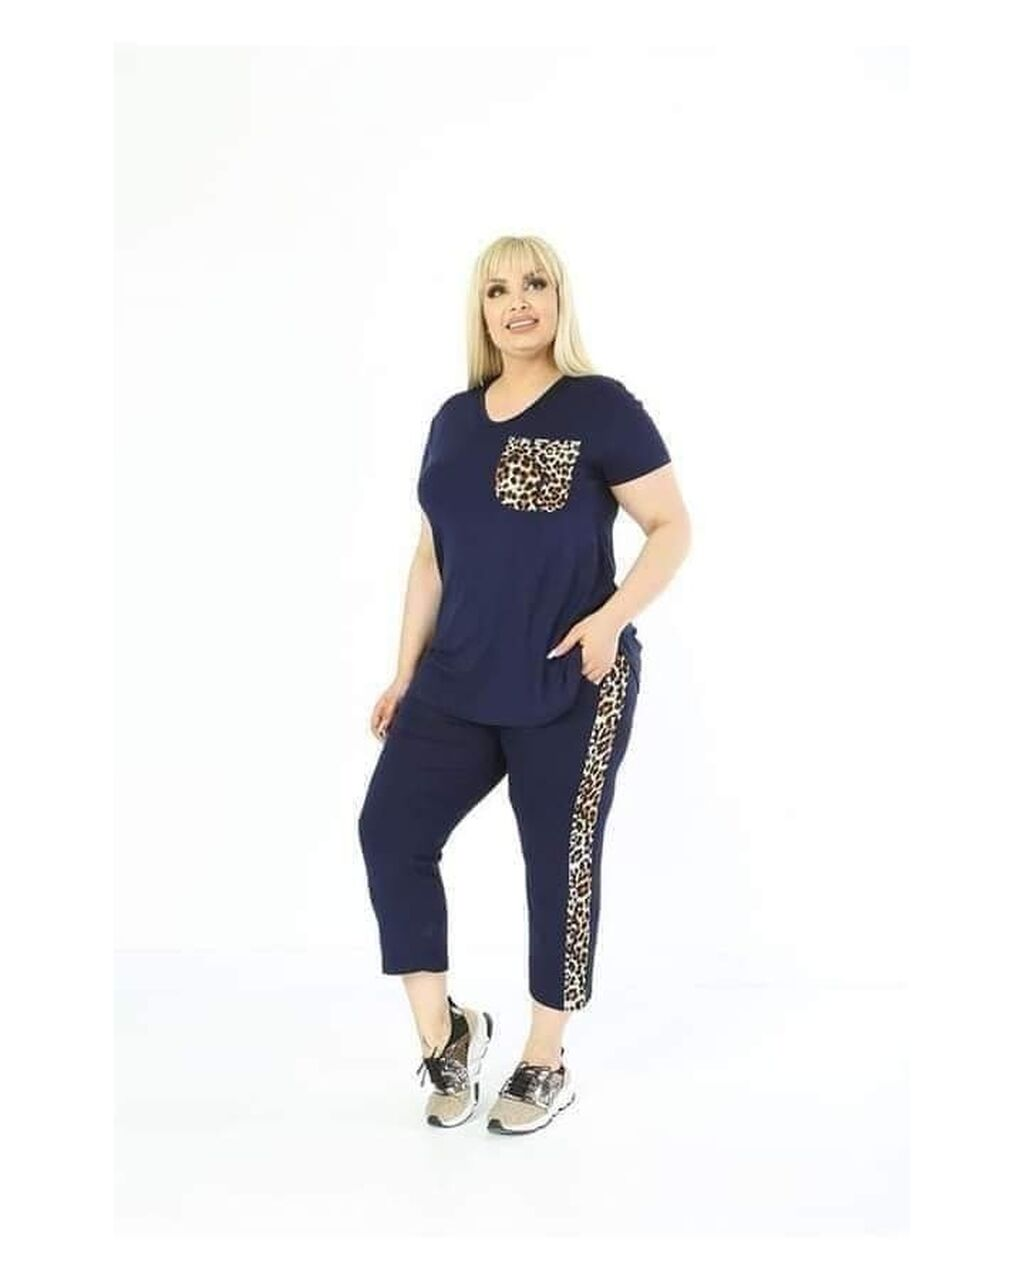 Ostala ženska odeća - Velika Plana: Komplet 2400 din Xl-4xl